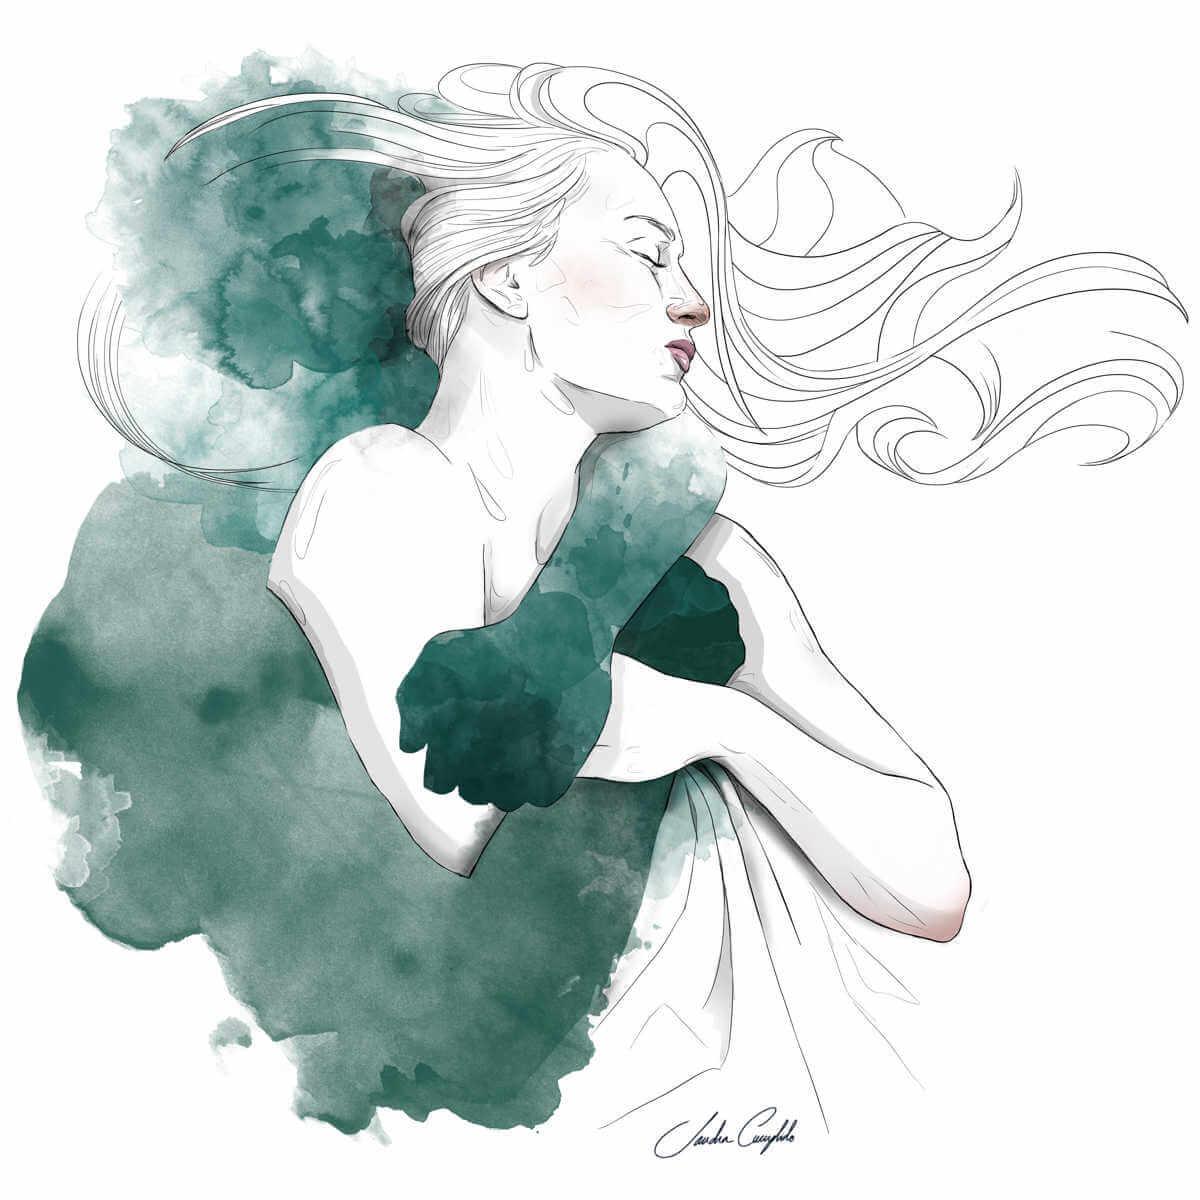 Mujer abrazda por sombra de sandra cumplido